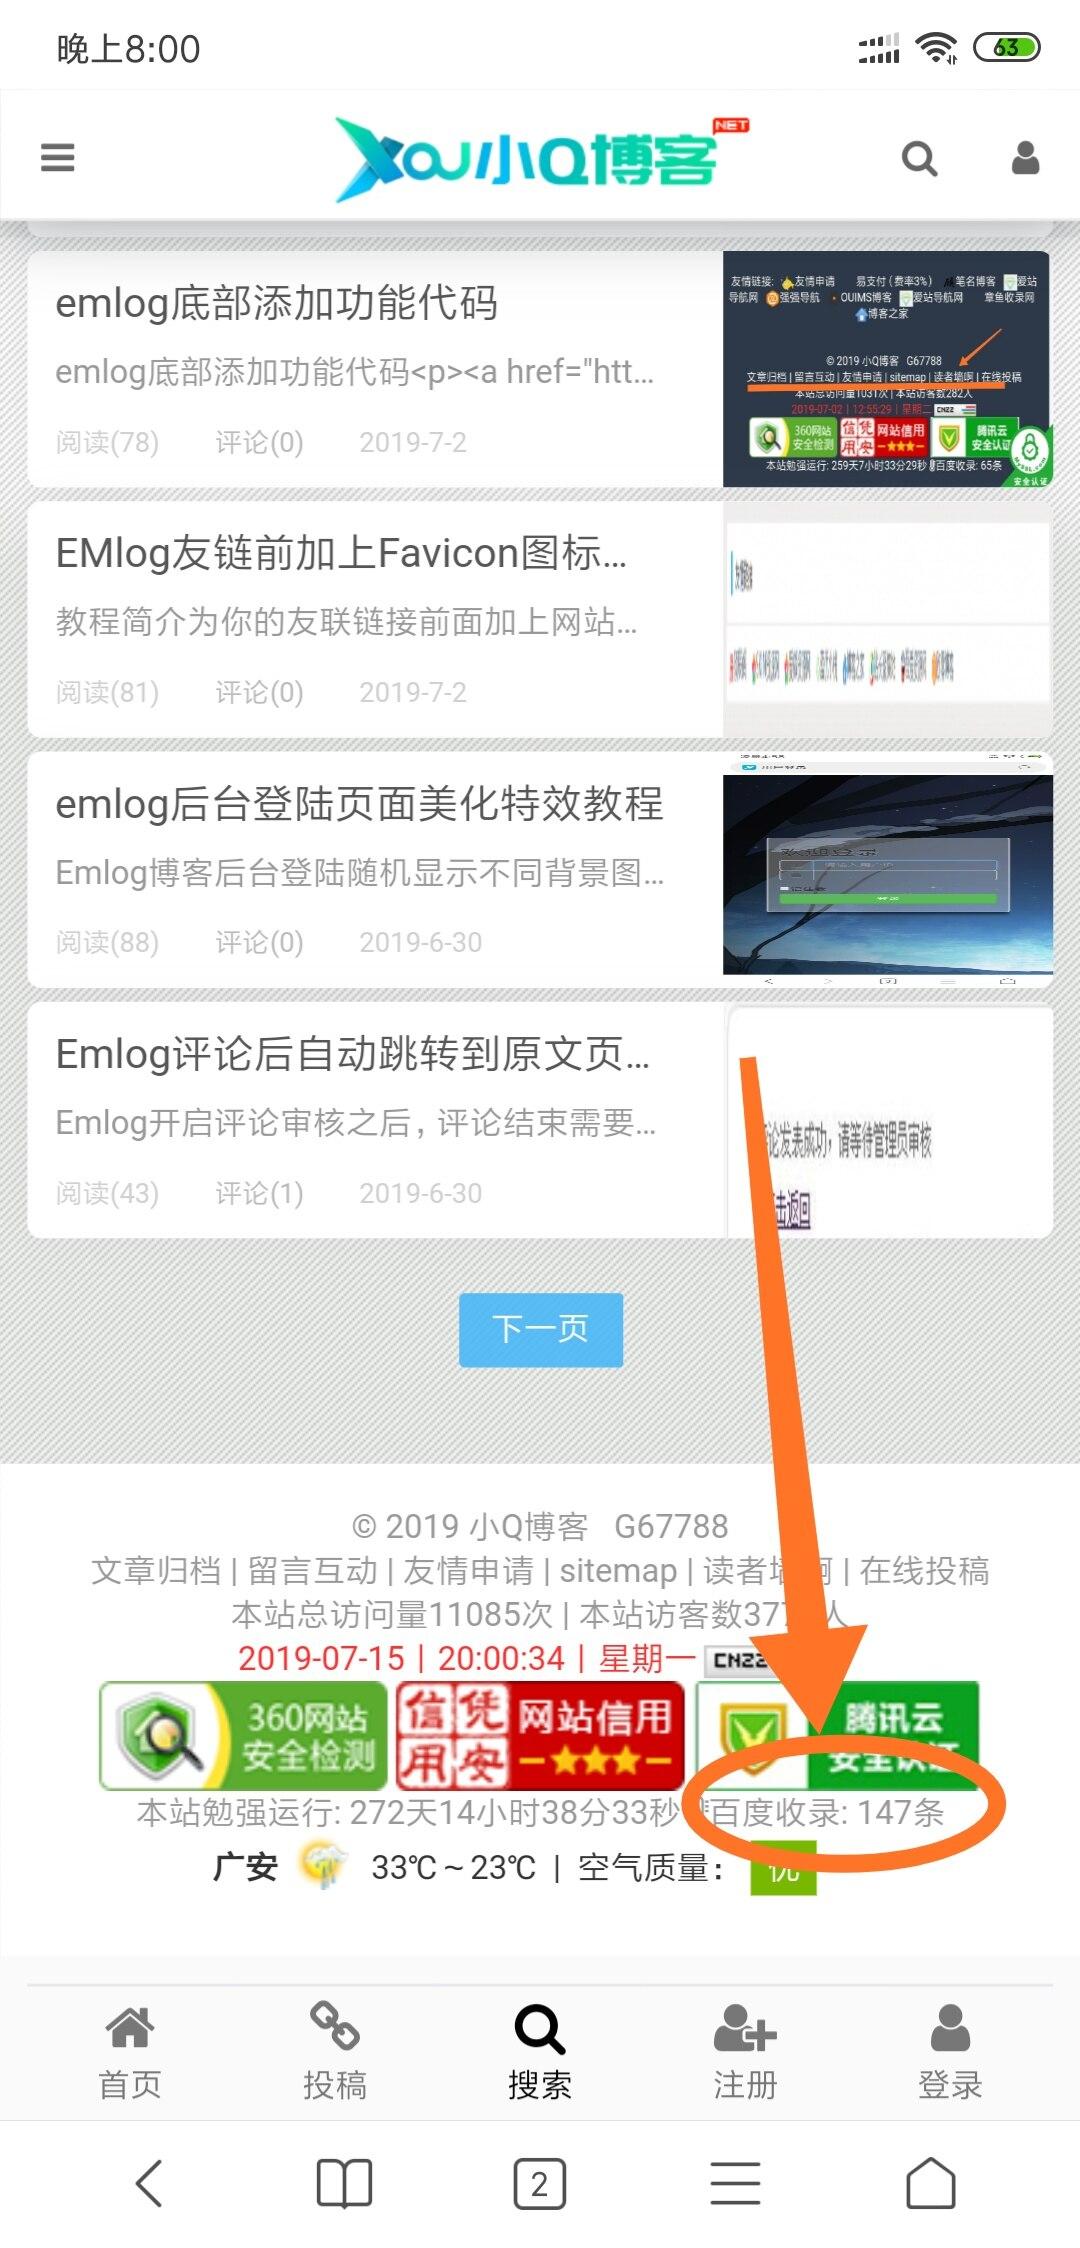 emlog网站统计收录显示